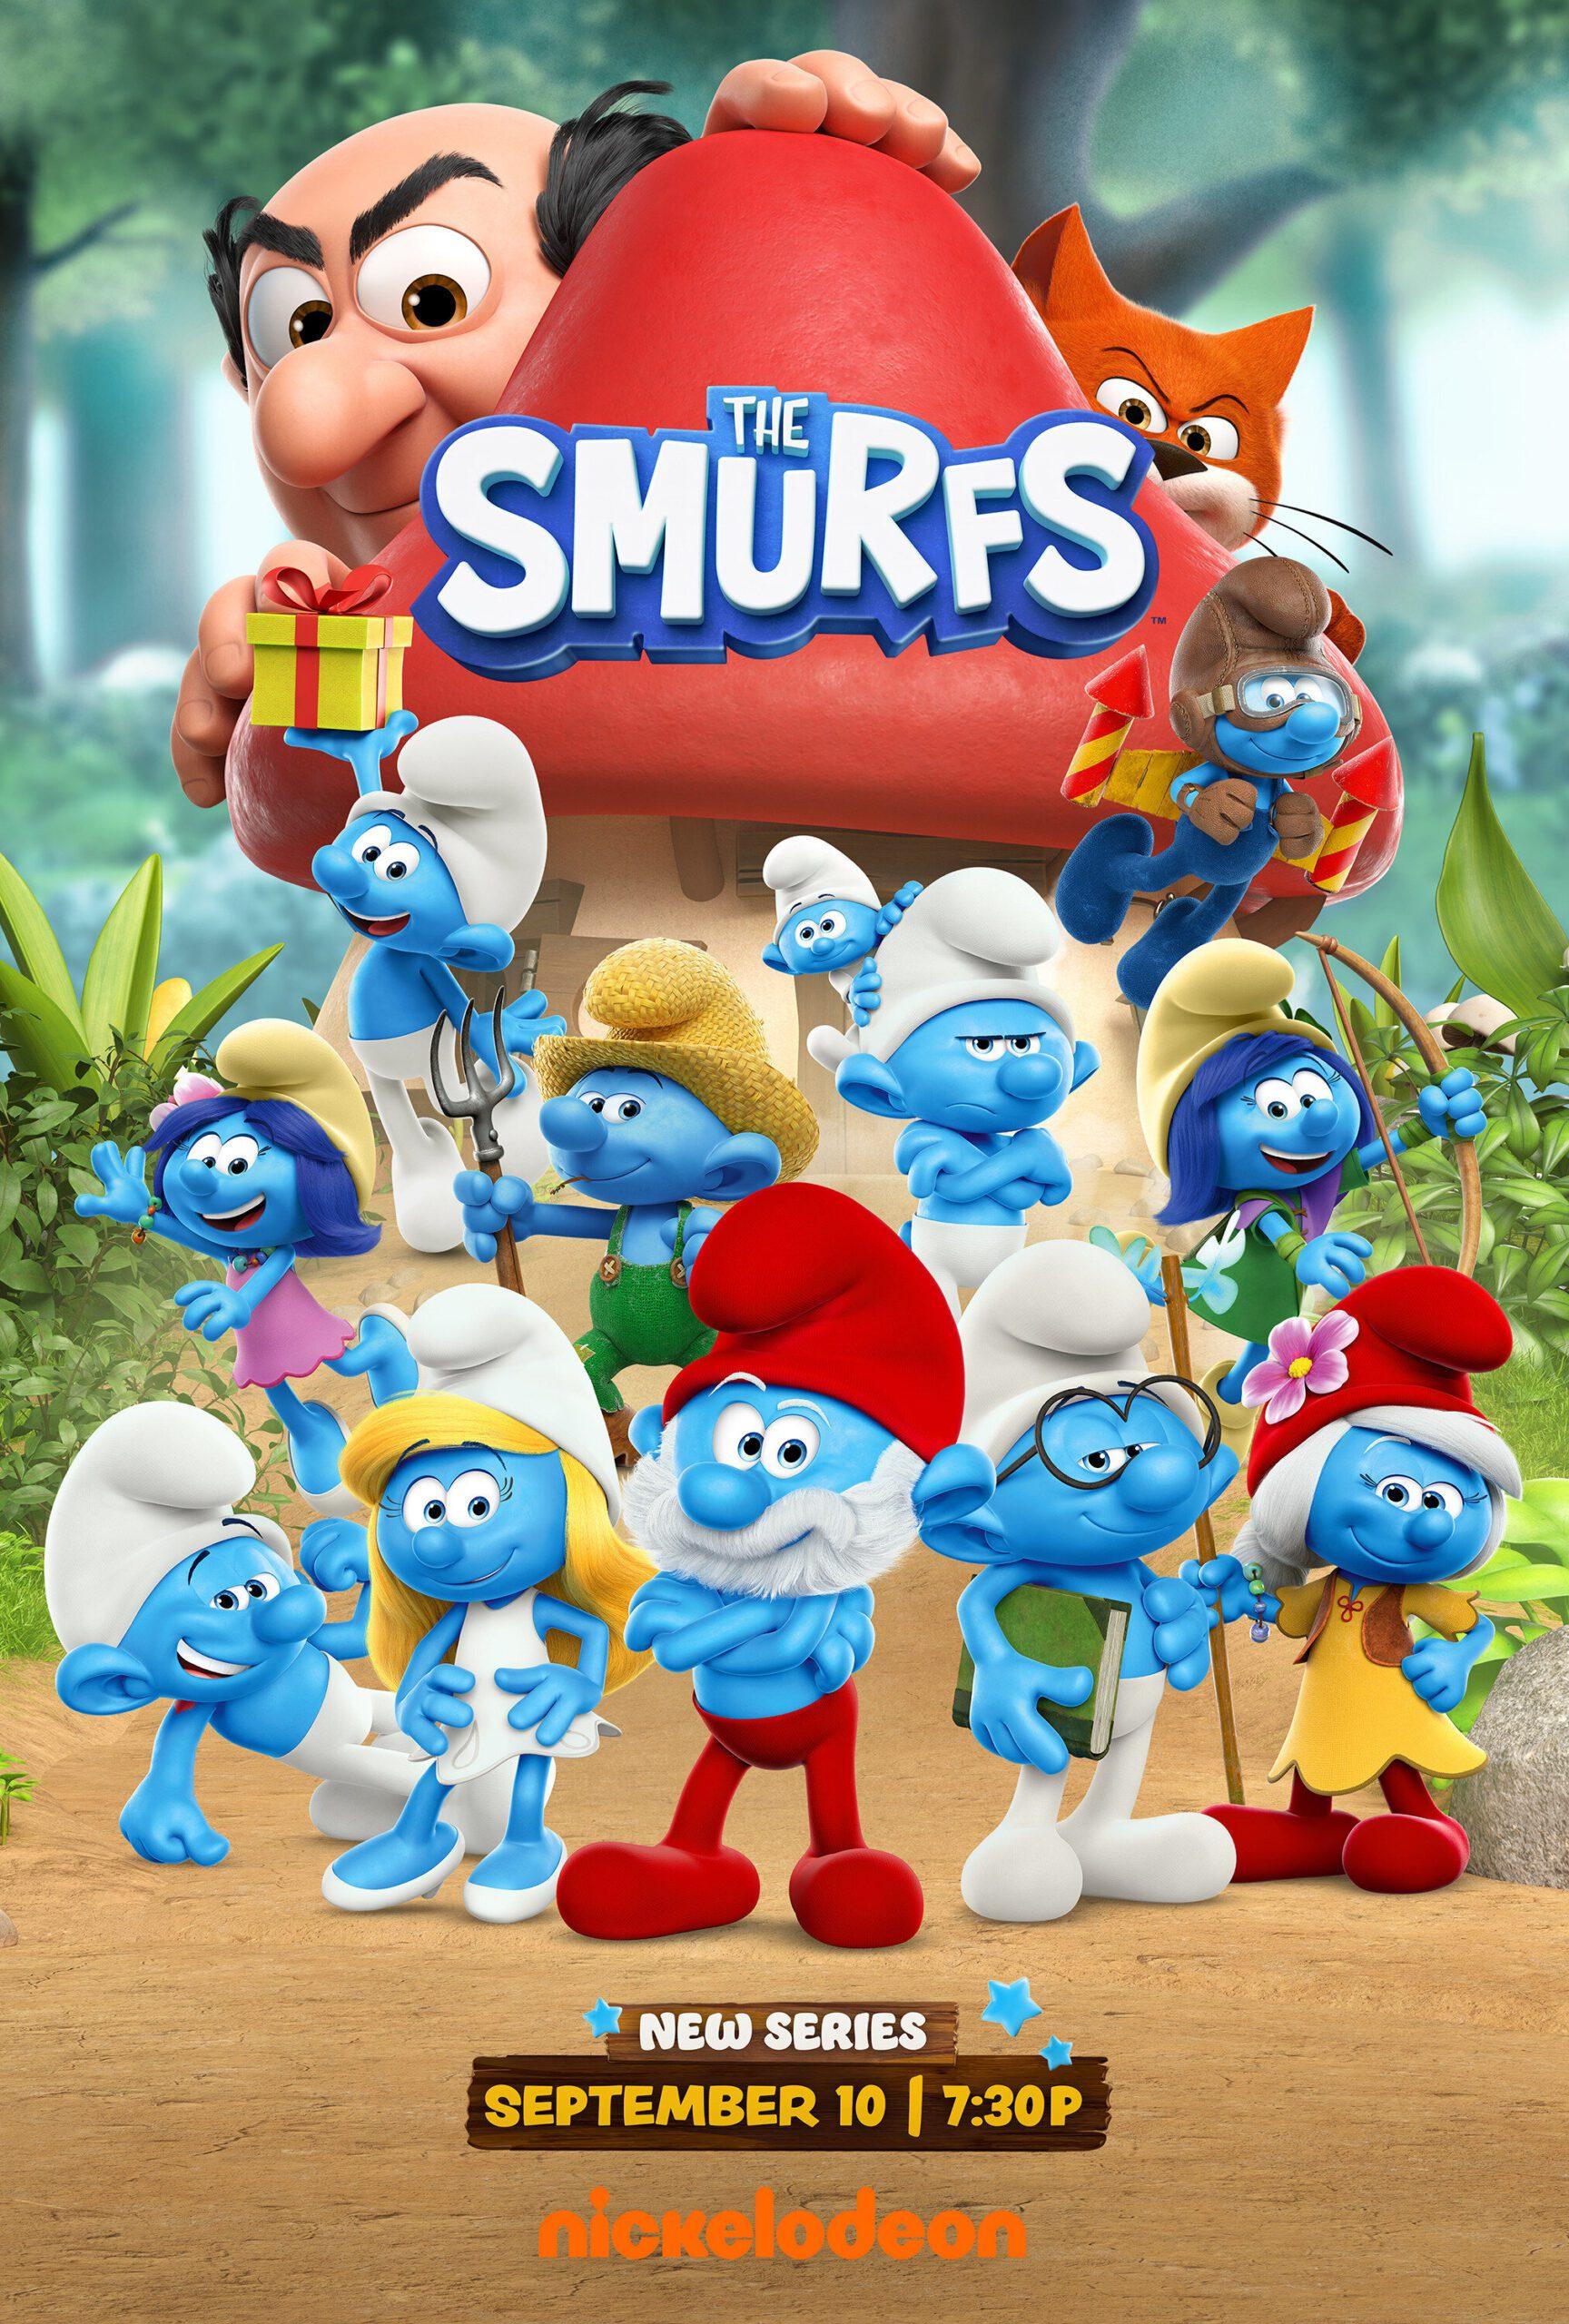 The Smurfs teaser image